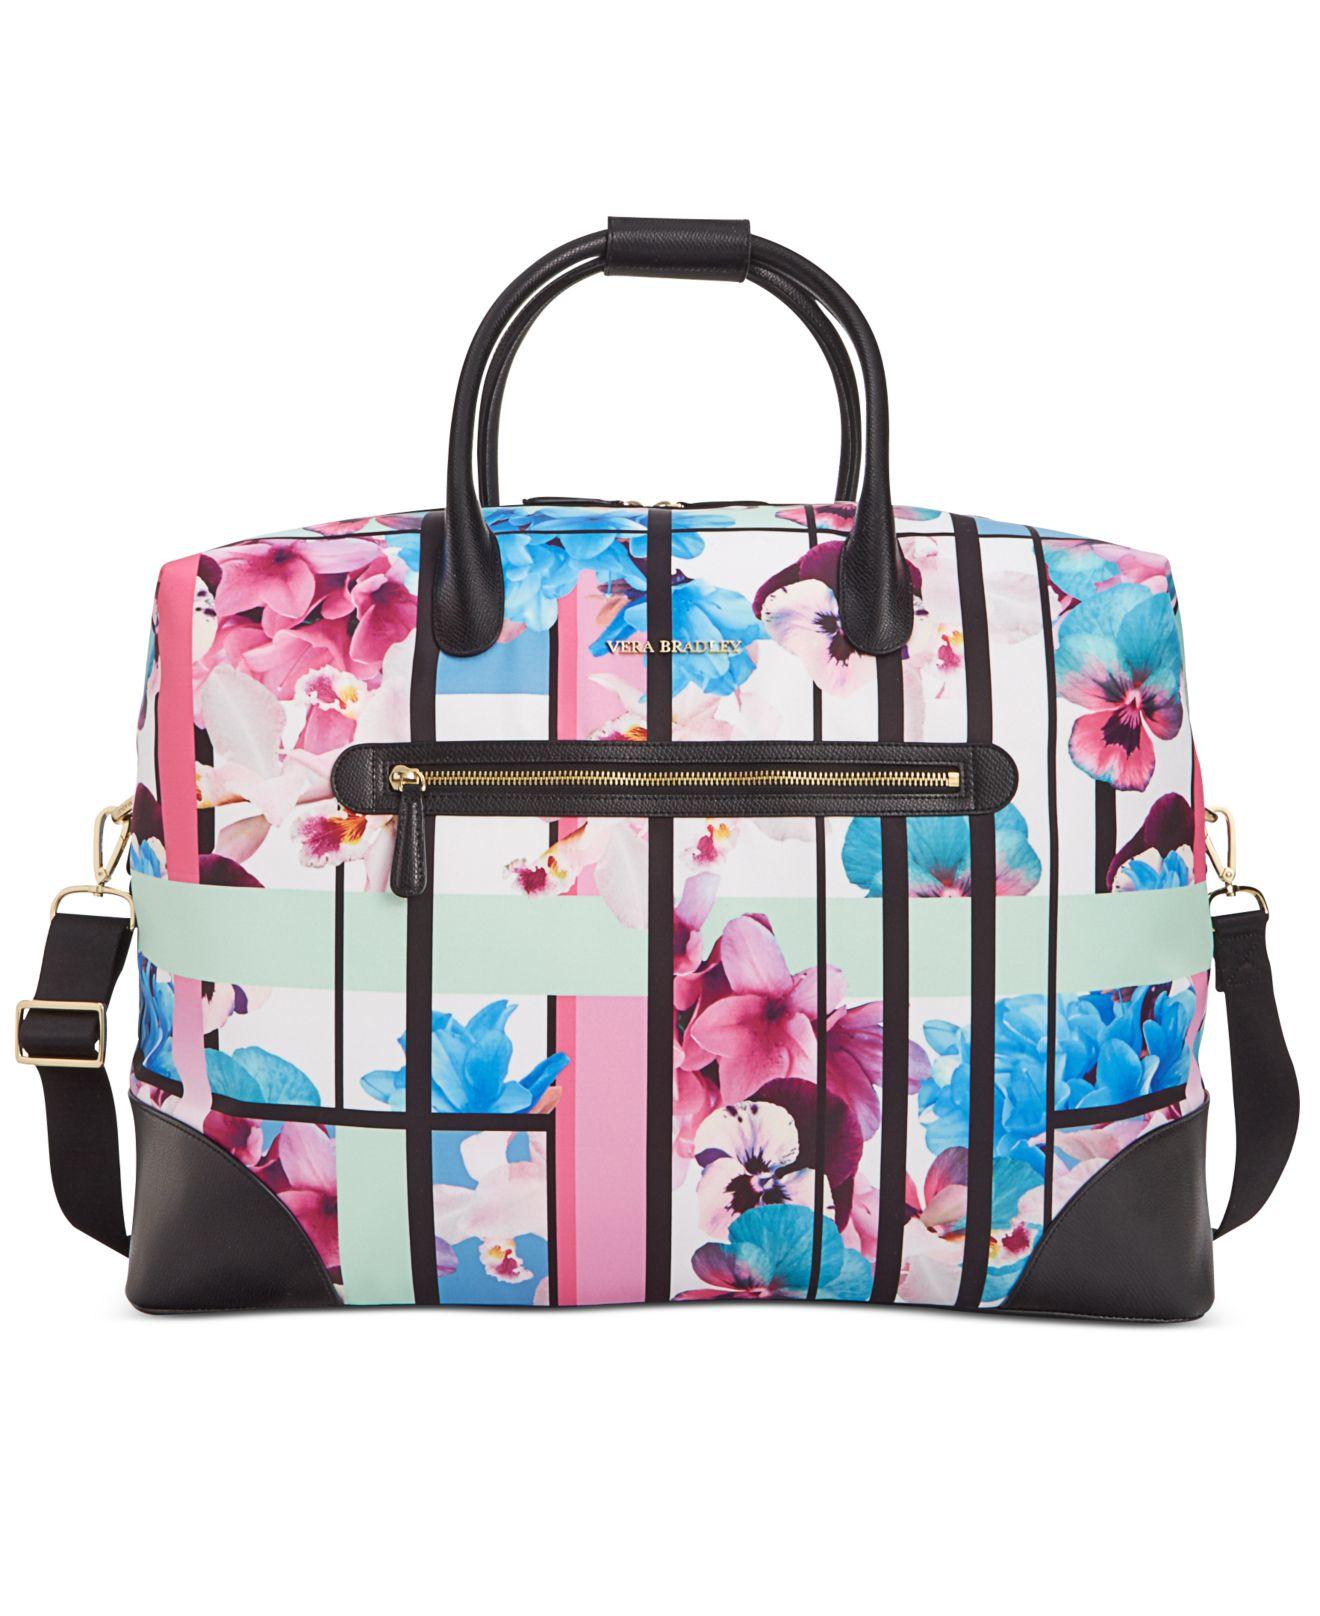 Vera Bradley Travel Duffel In Multicolor (Floral) - Save 25%   Lyst